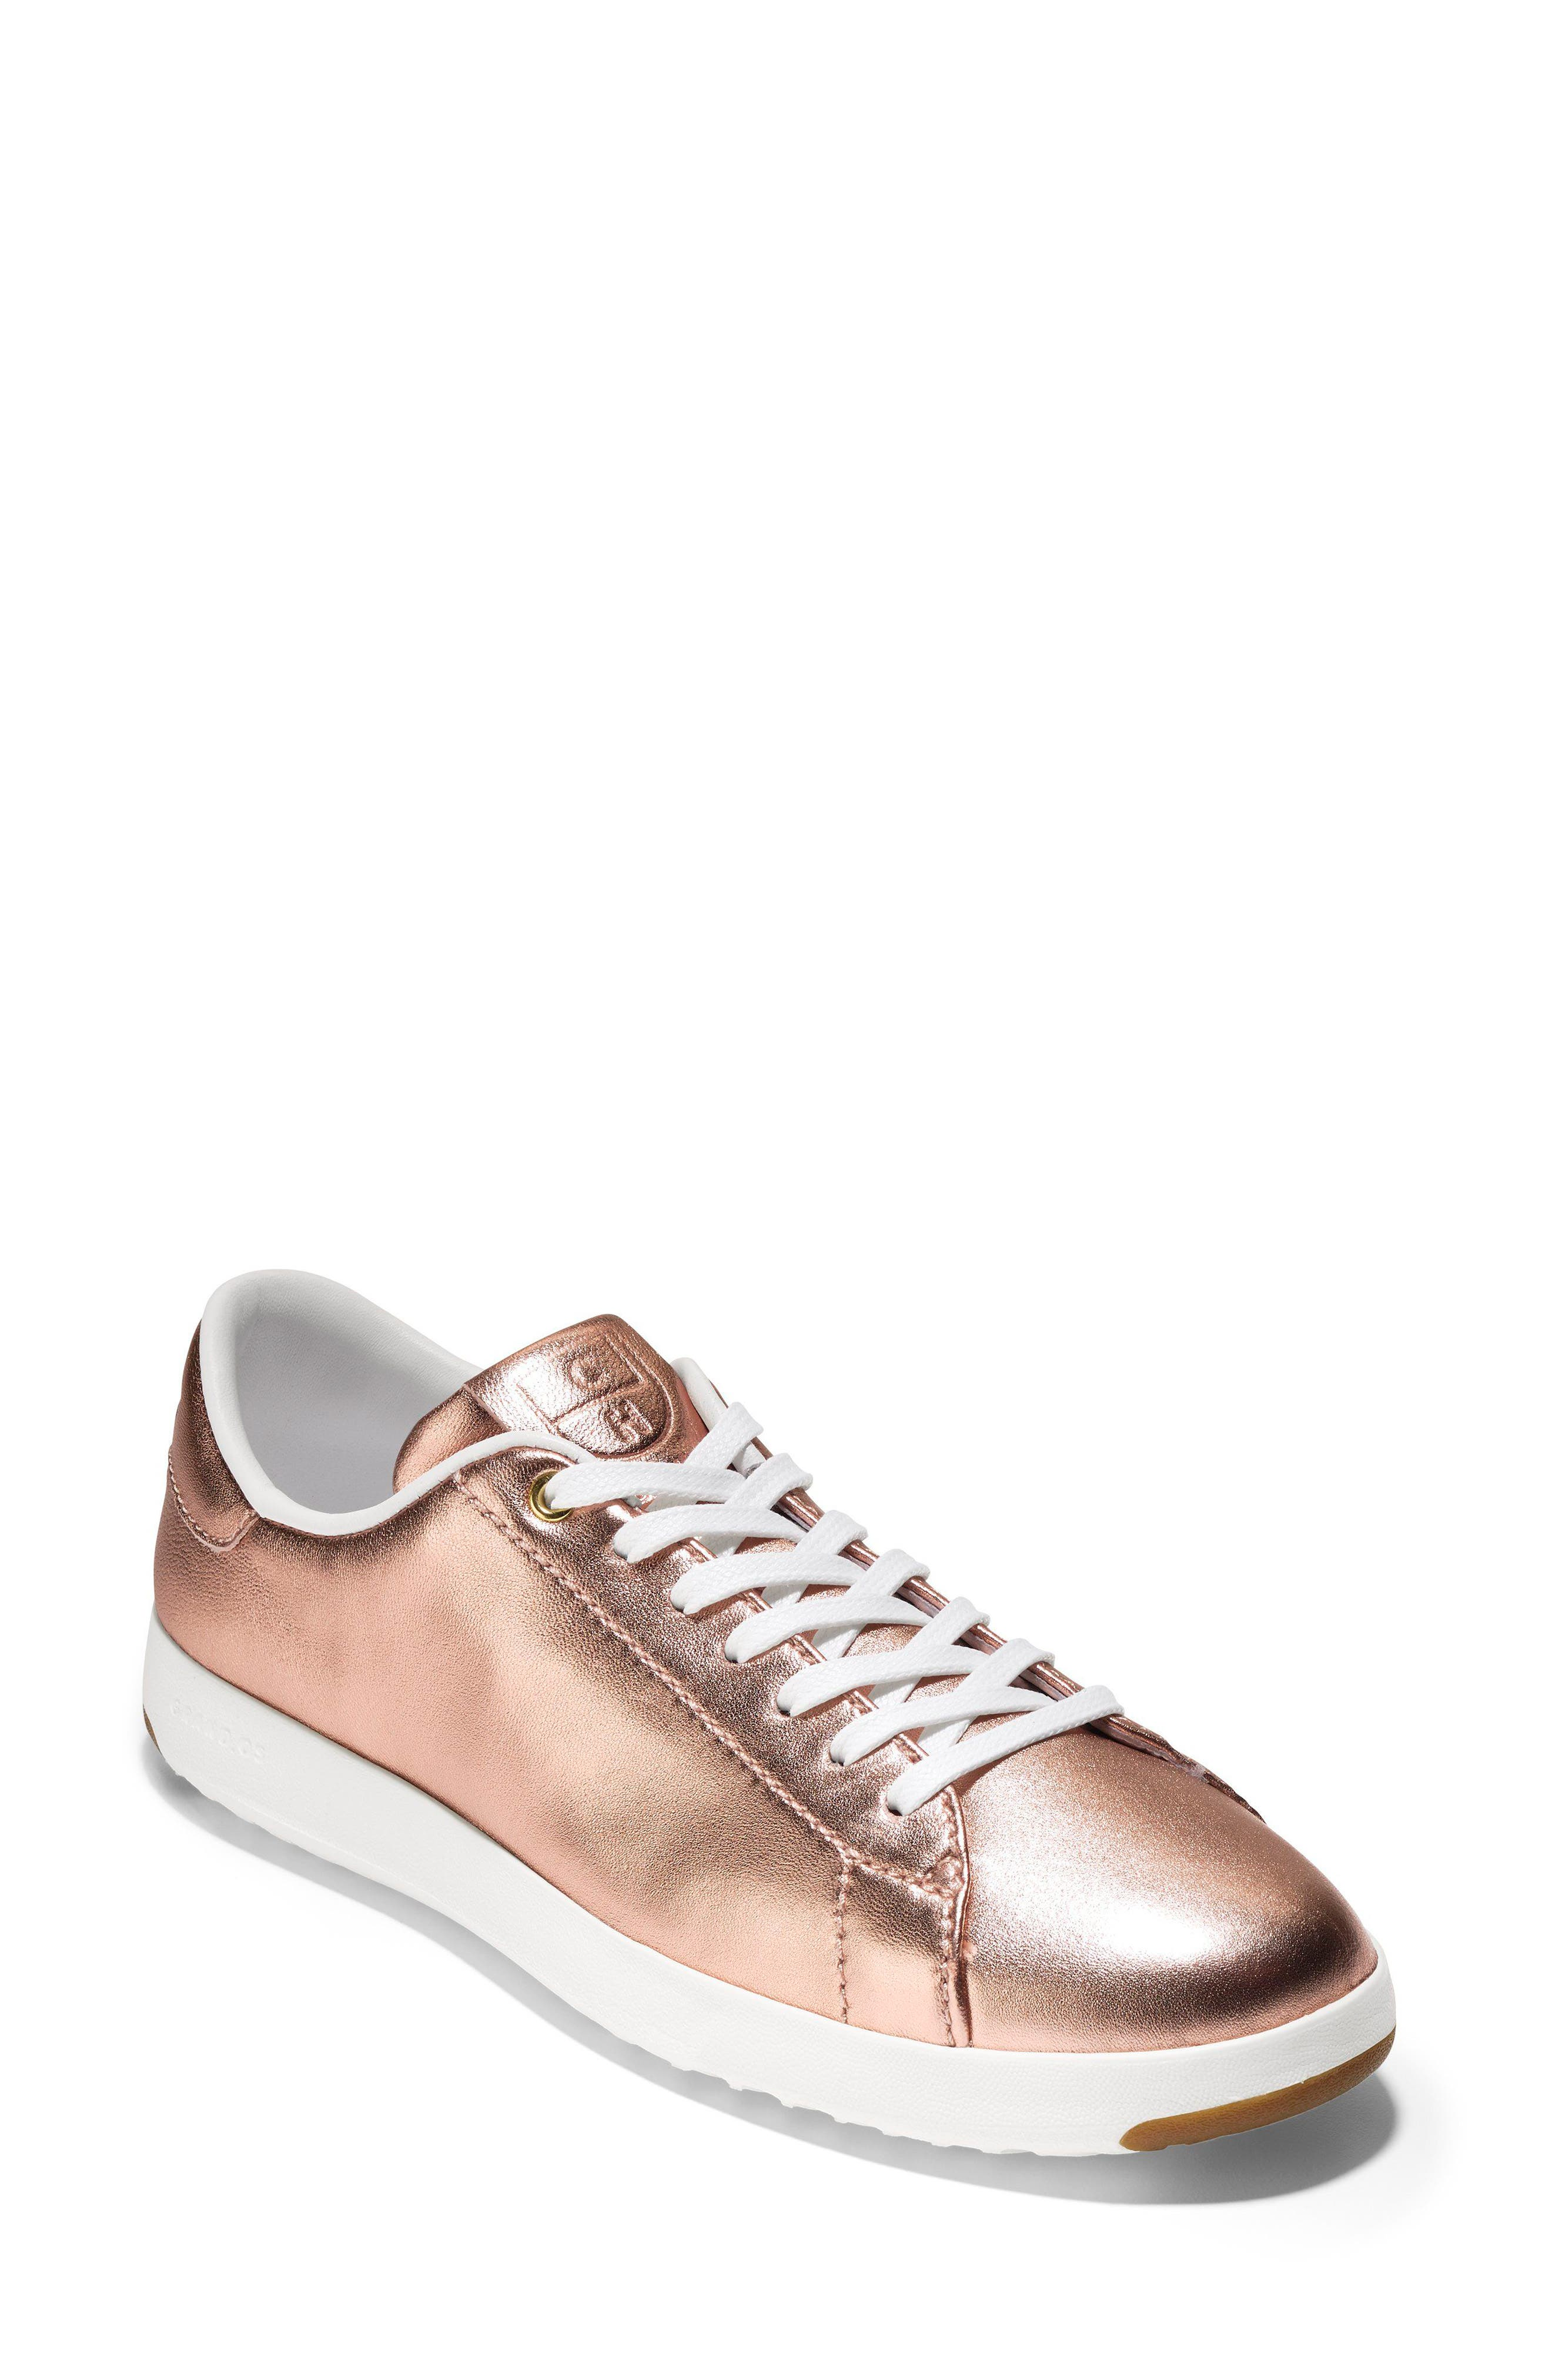 GrandPro Tennis Shoe,                         Main,                         color, Rose Gold Leather